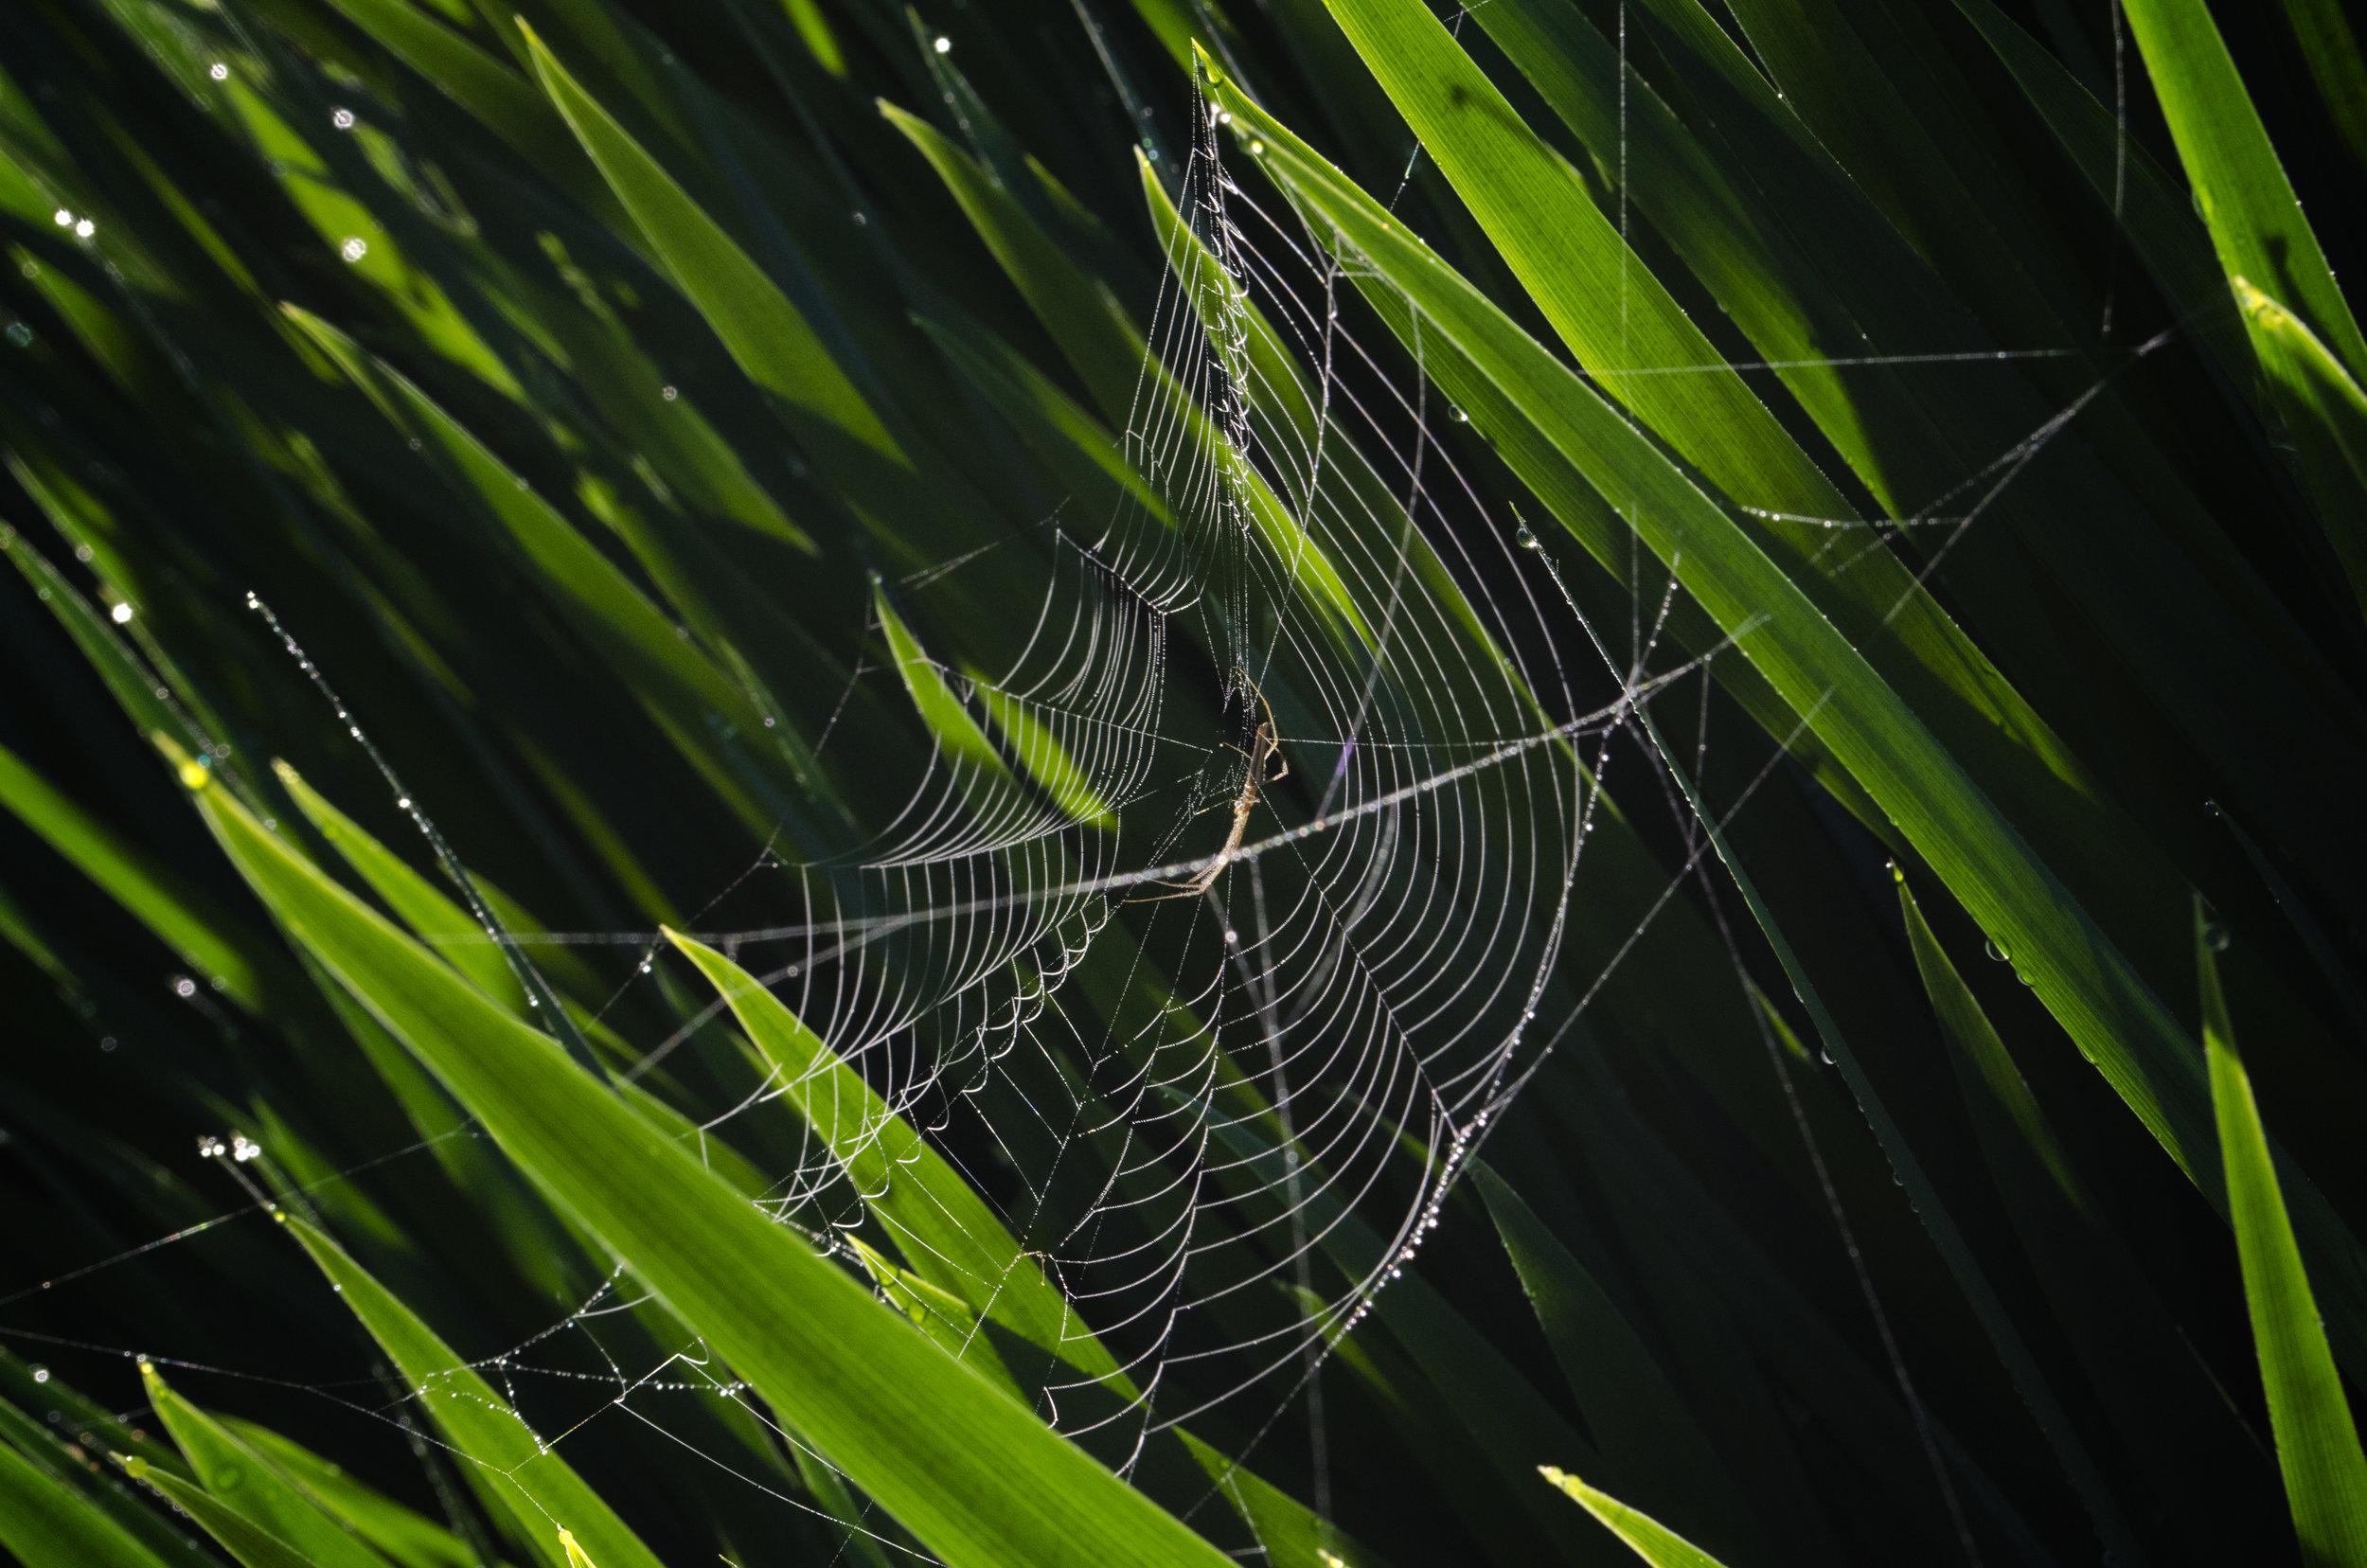 spider_17250878193_o.jpg